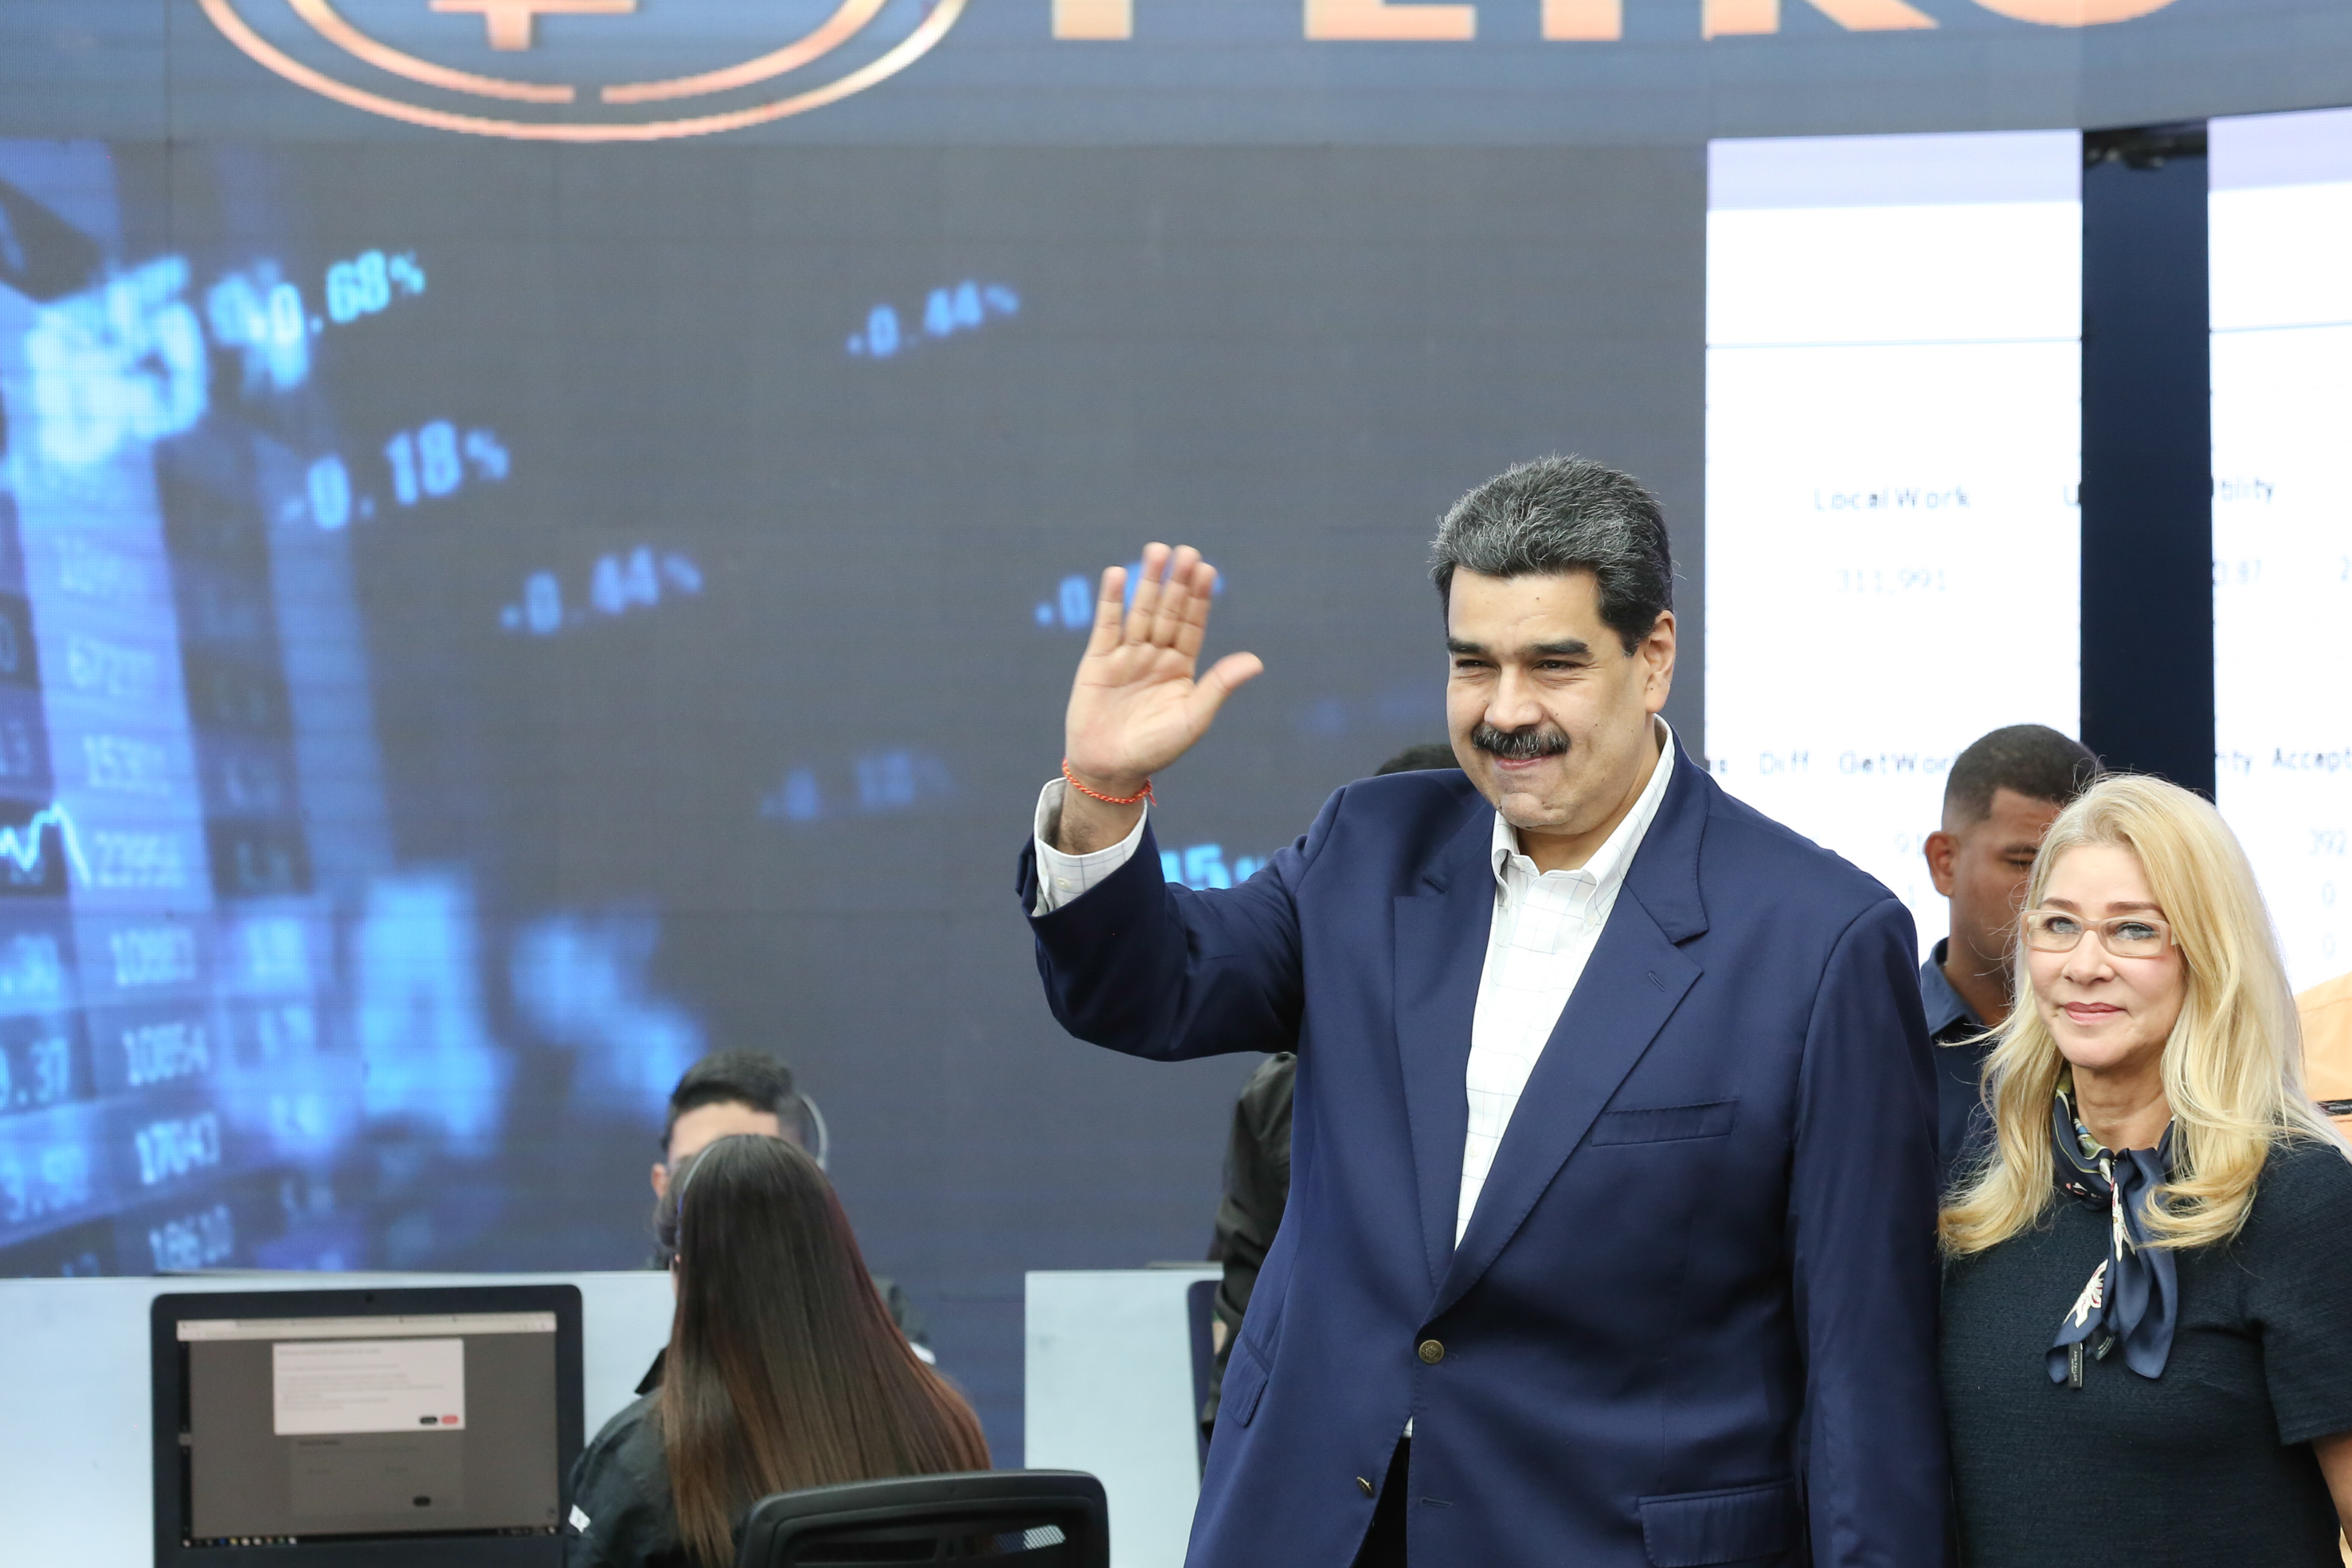 Presidente Maduro aprueba 30 millones de barriles de petróleo a la Sunacrip